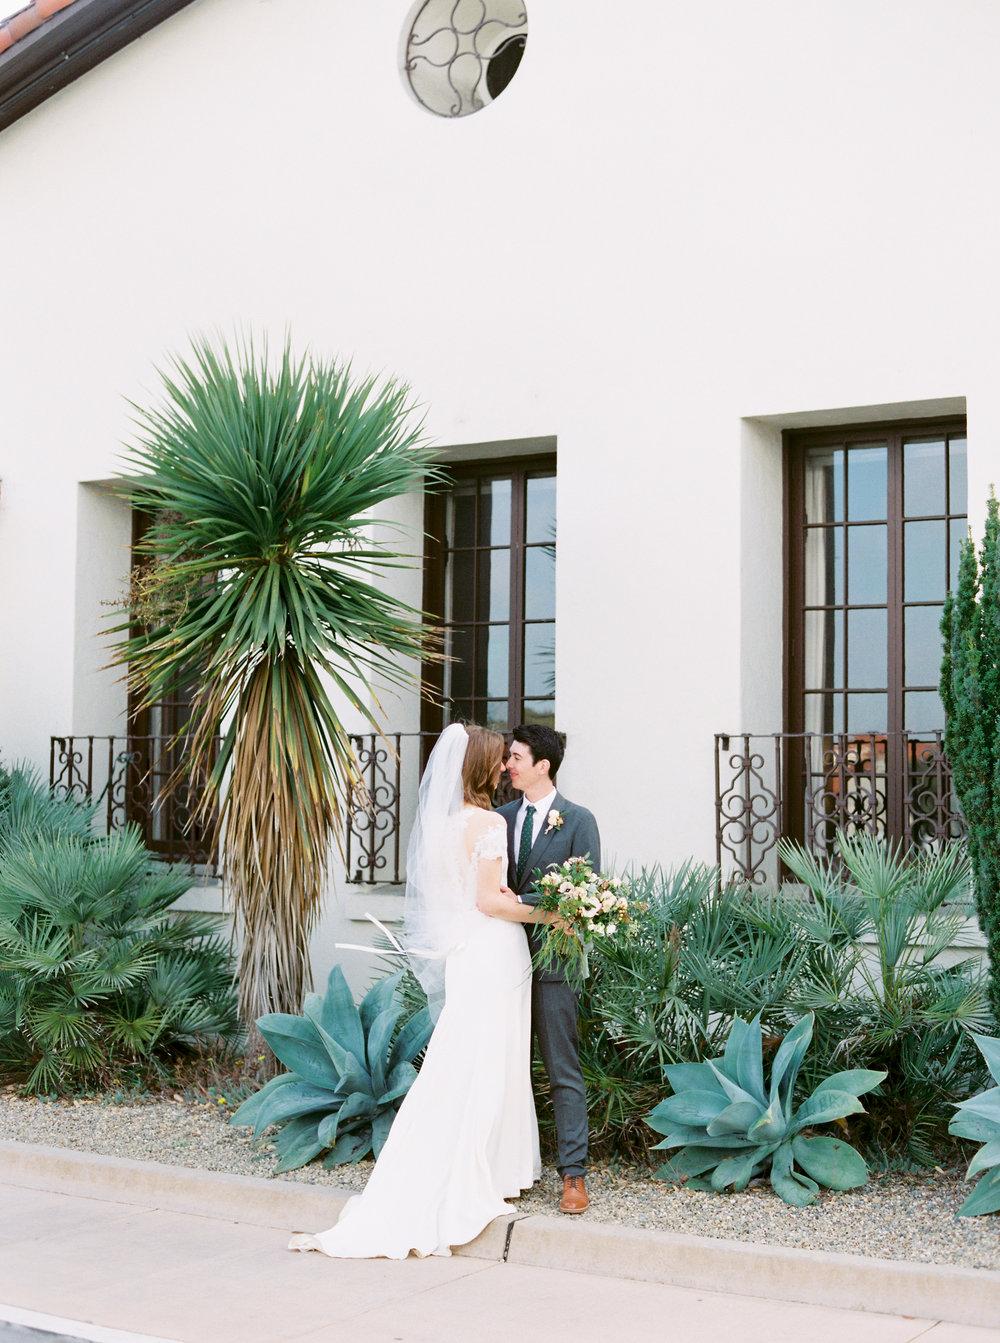 Log-cabin-wedding-in-presidio-san-francisco-california-desintation-wedding-photography-84.jpg